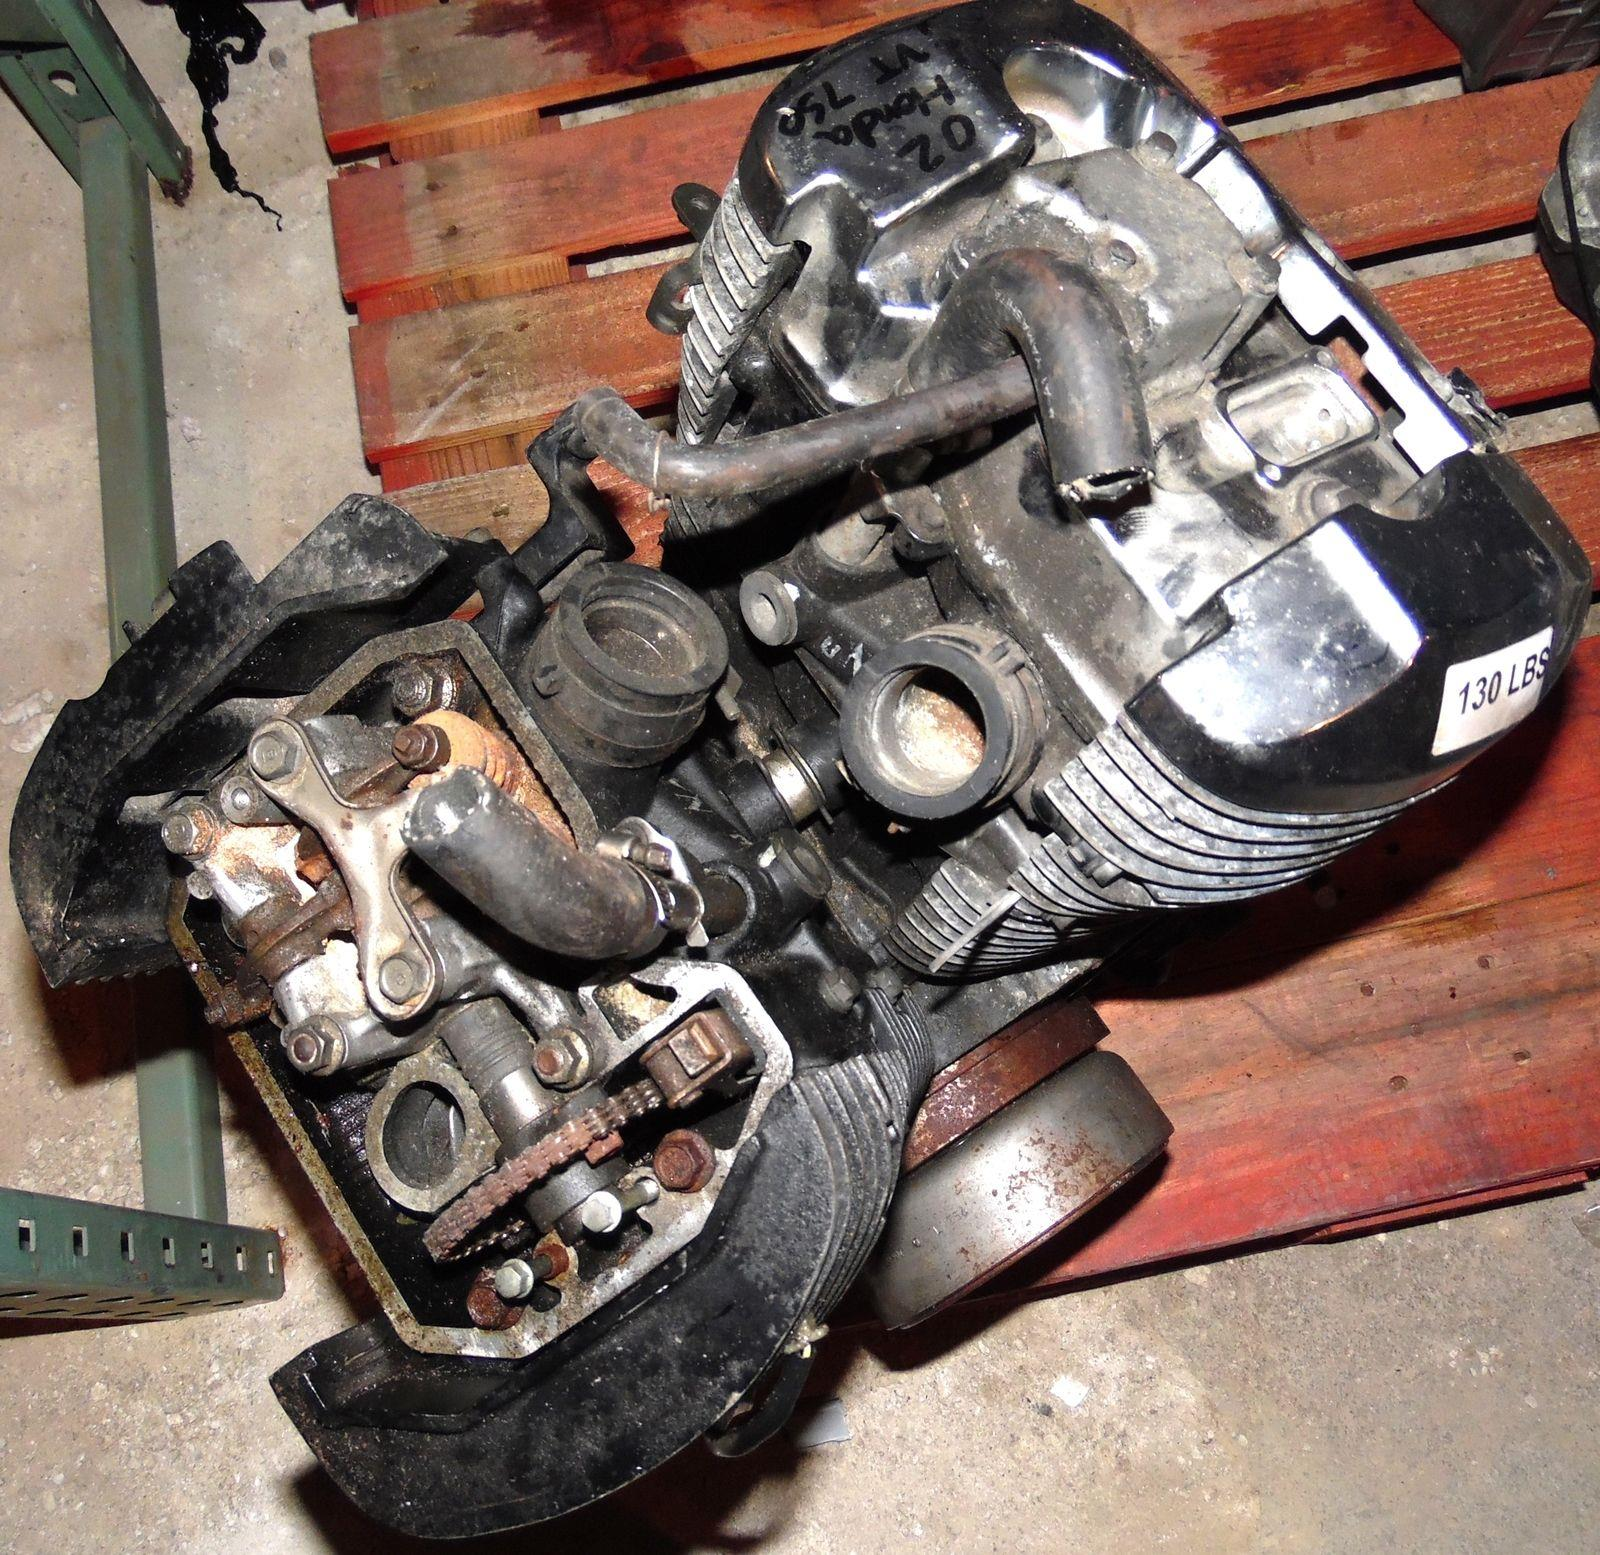 Honda Motorcycle With Fit Engine: 2002 Honda VT 750 Shadow OEM Motorcycle Engine Motor W